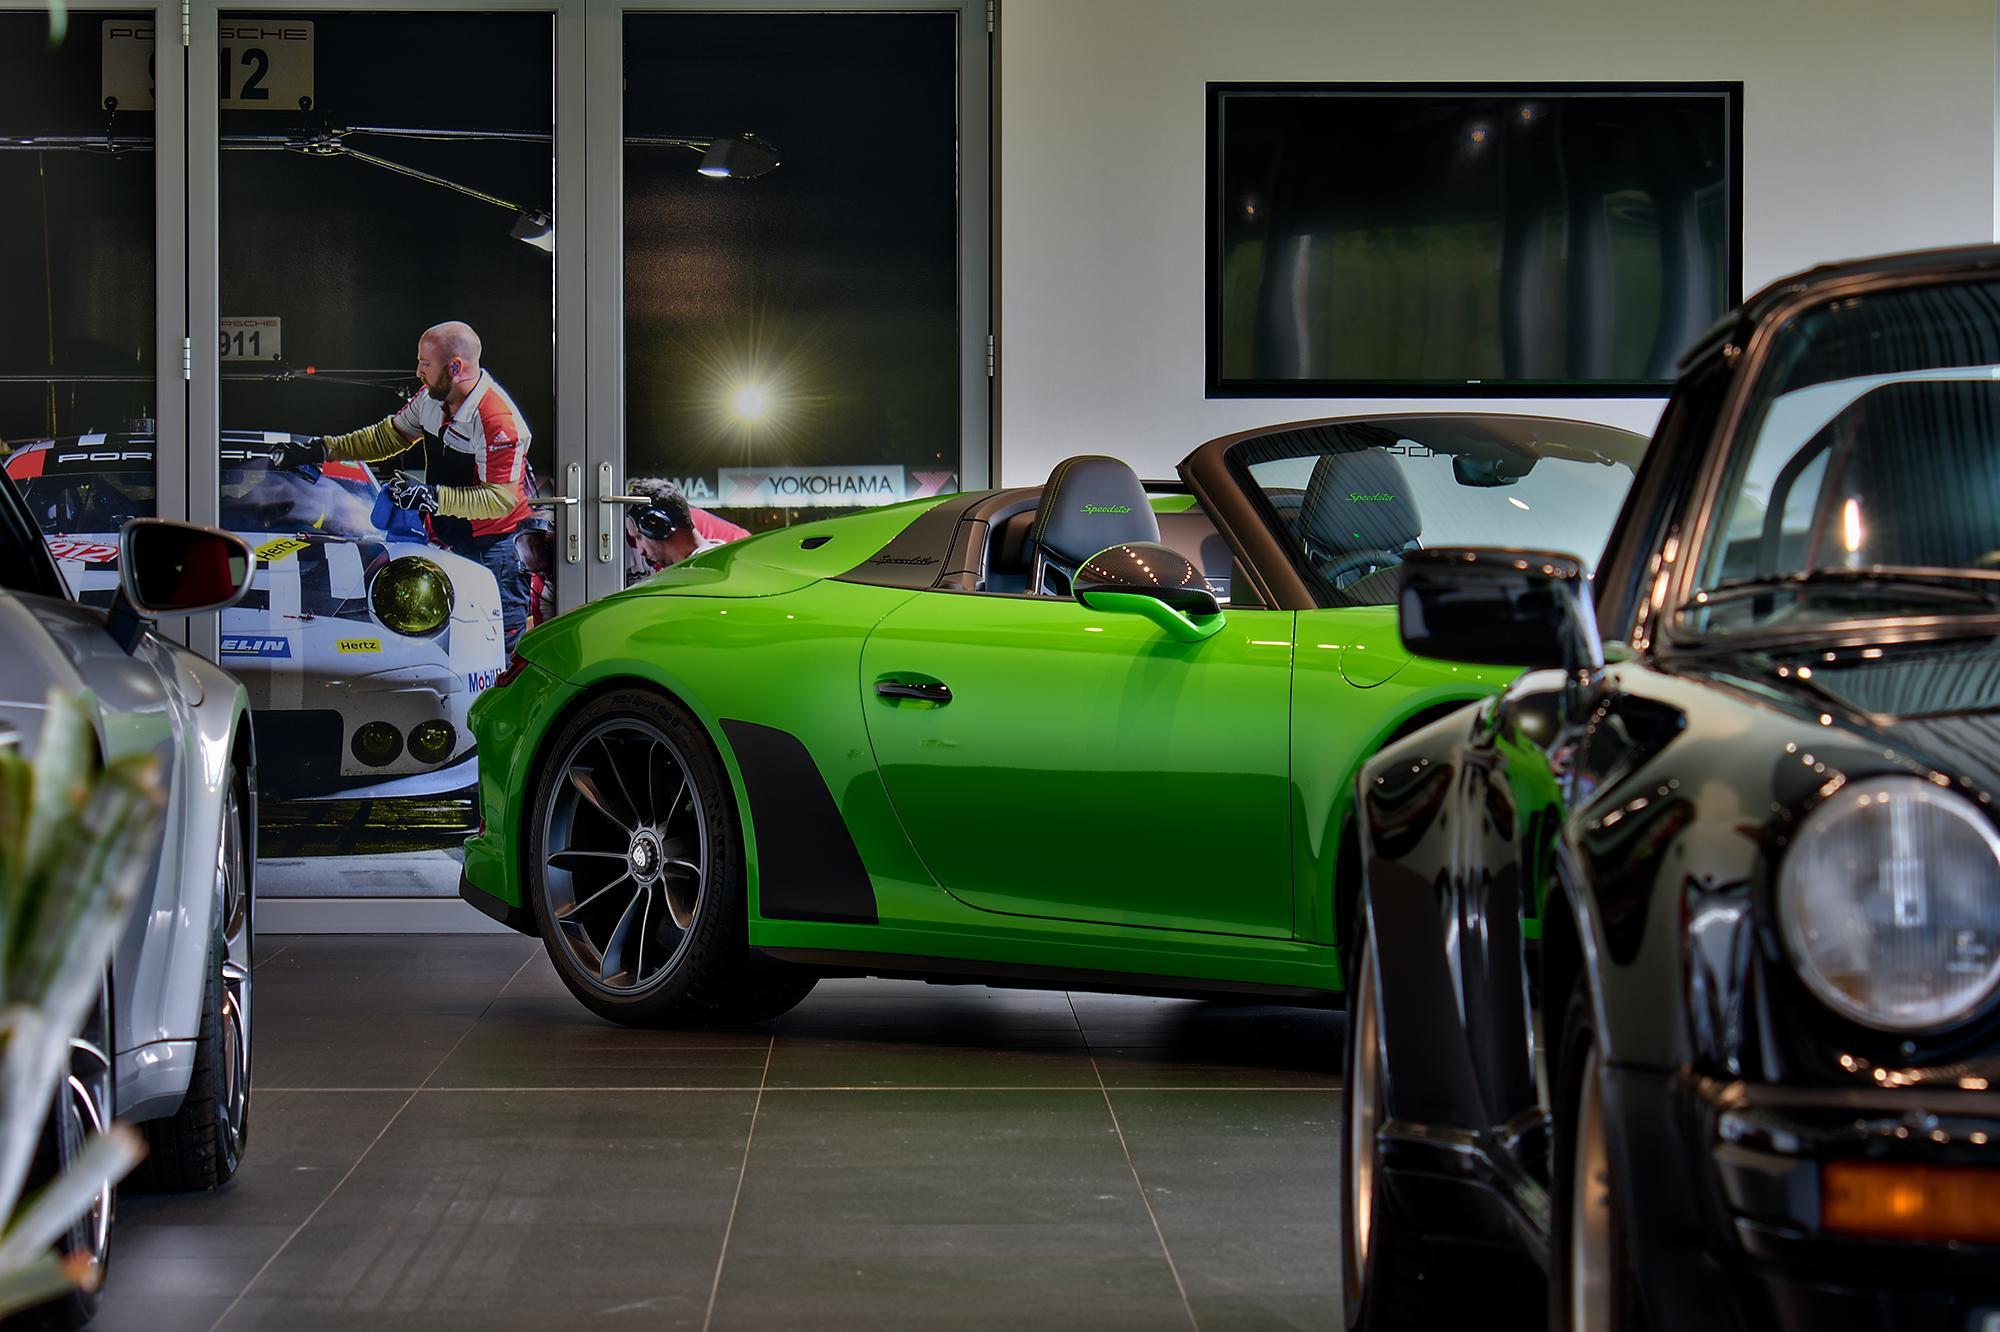 HDR photographic image - Porsche 8